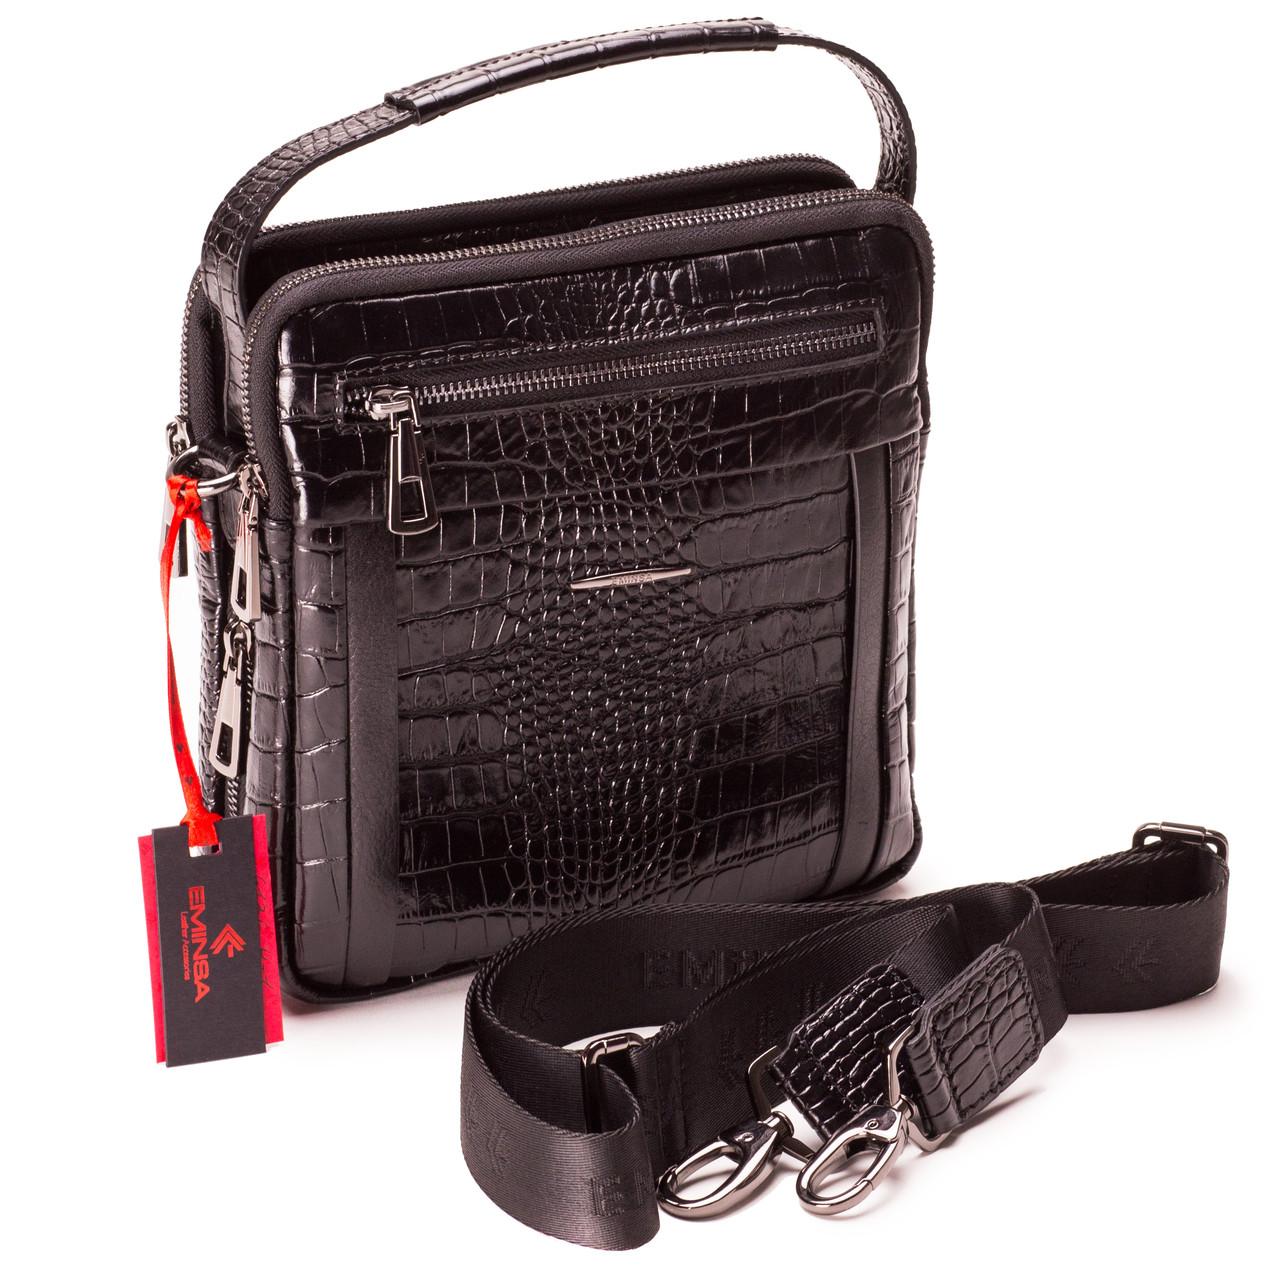 0cb9fd1ad61c Мужская сумка кожаная черная Eminsa 6136-4-1: от